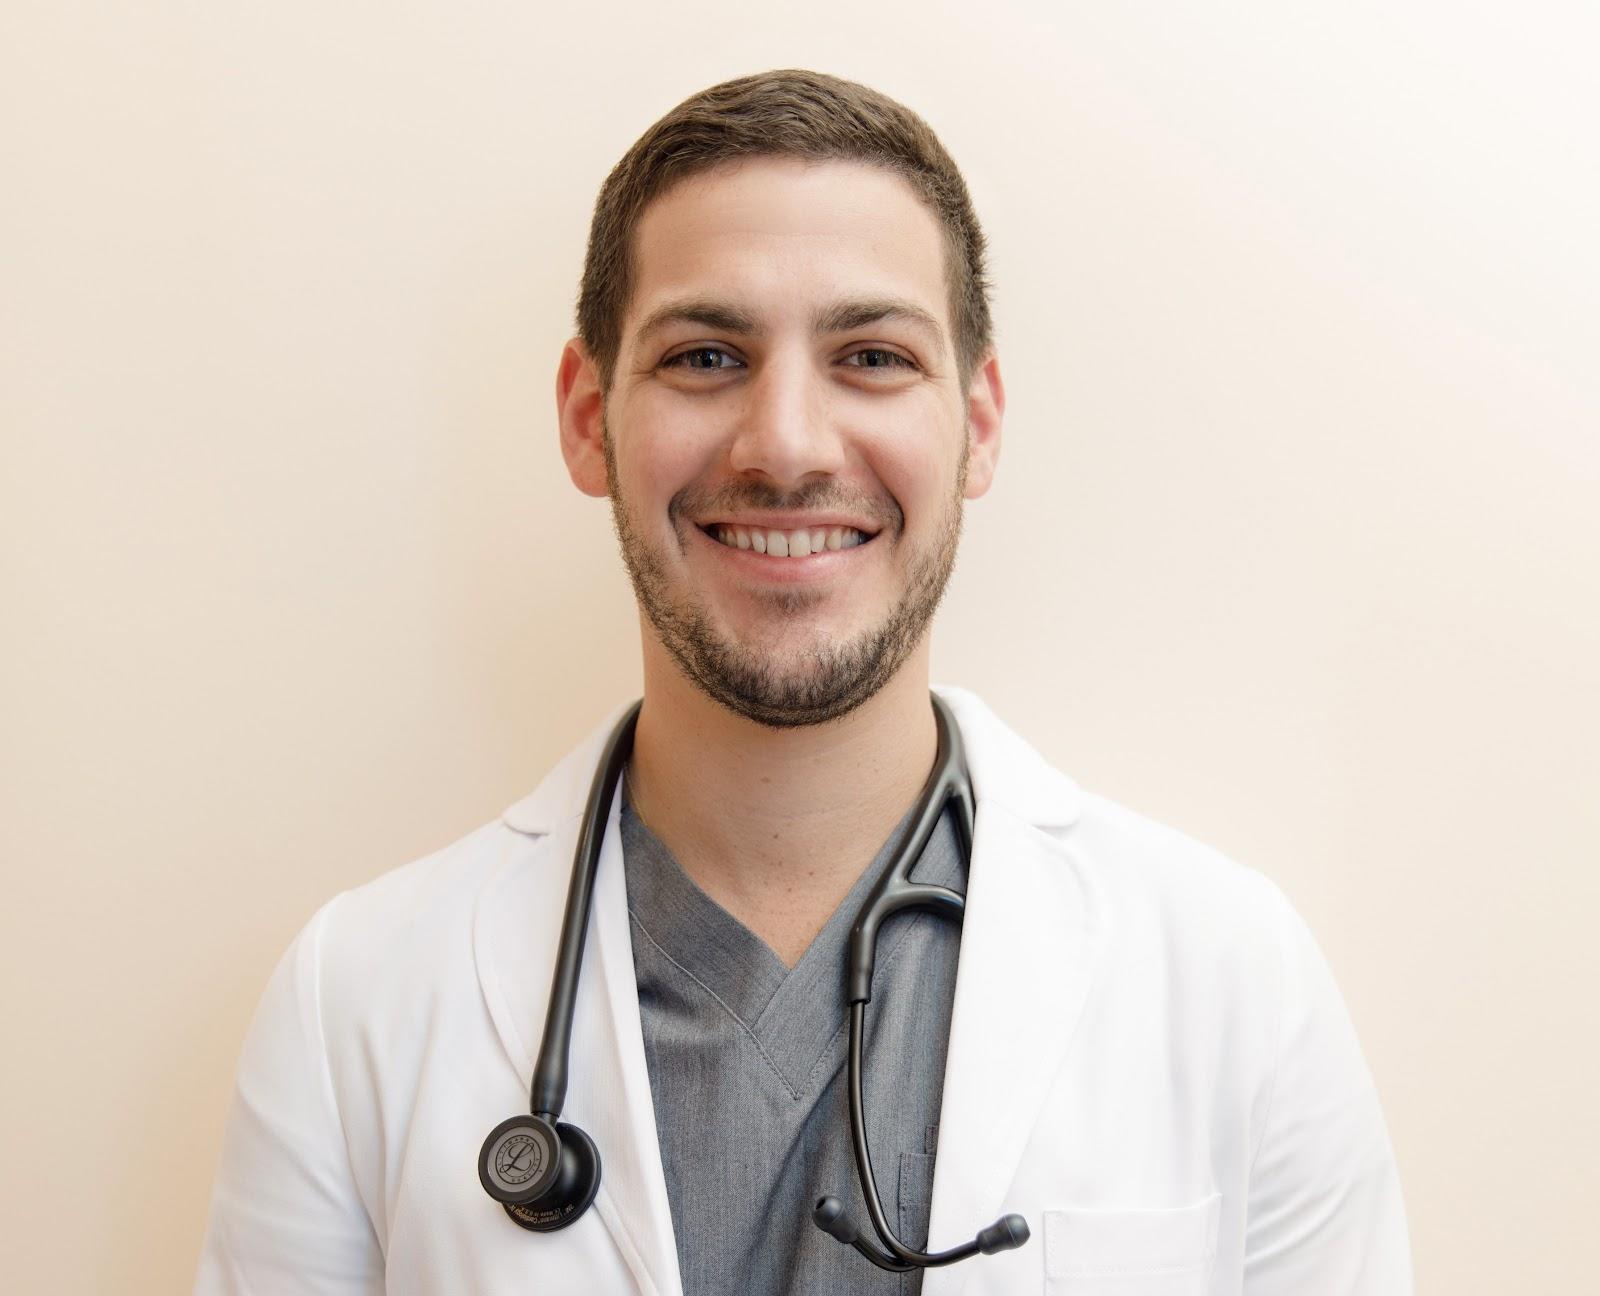 dr. kimmelstiel